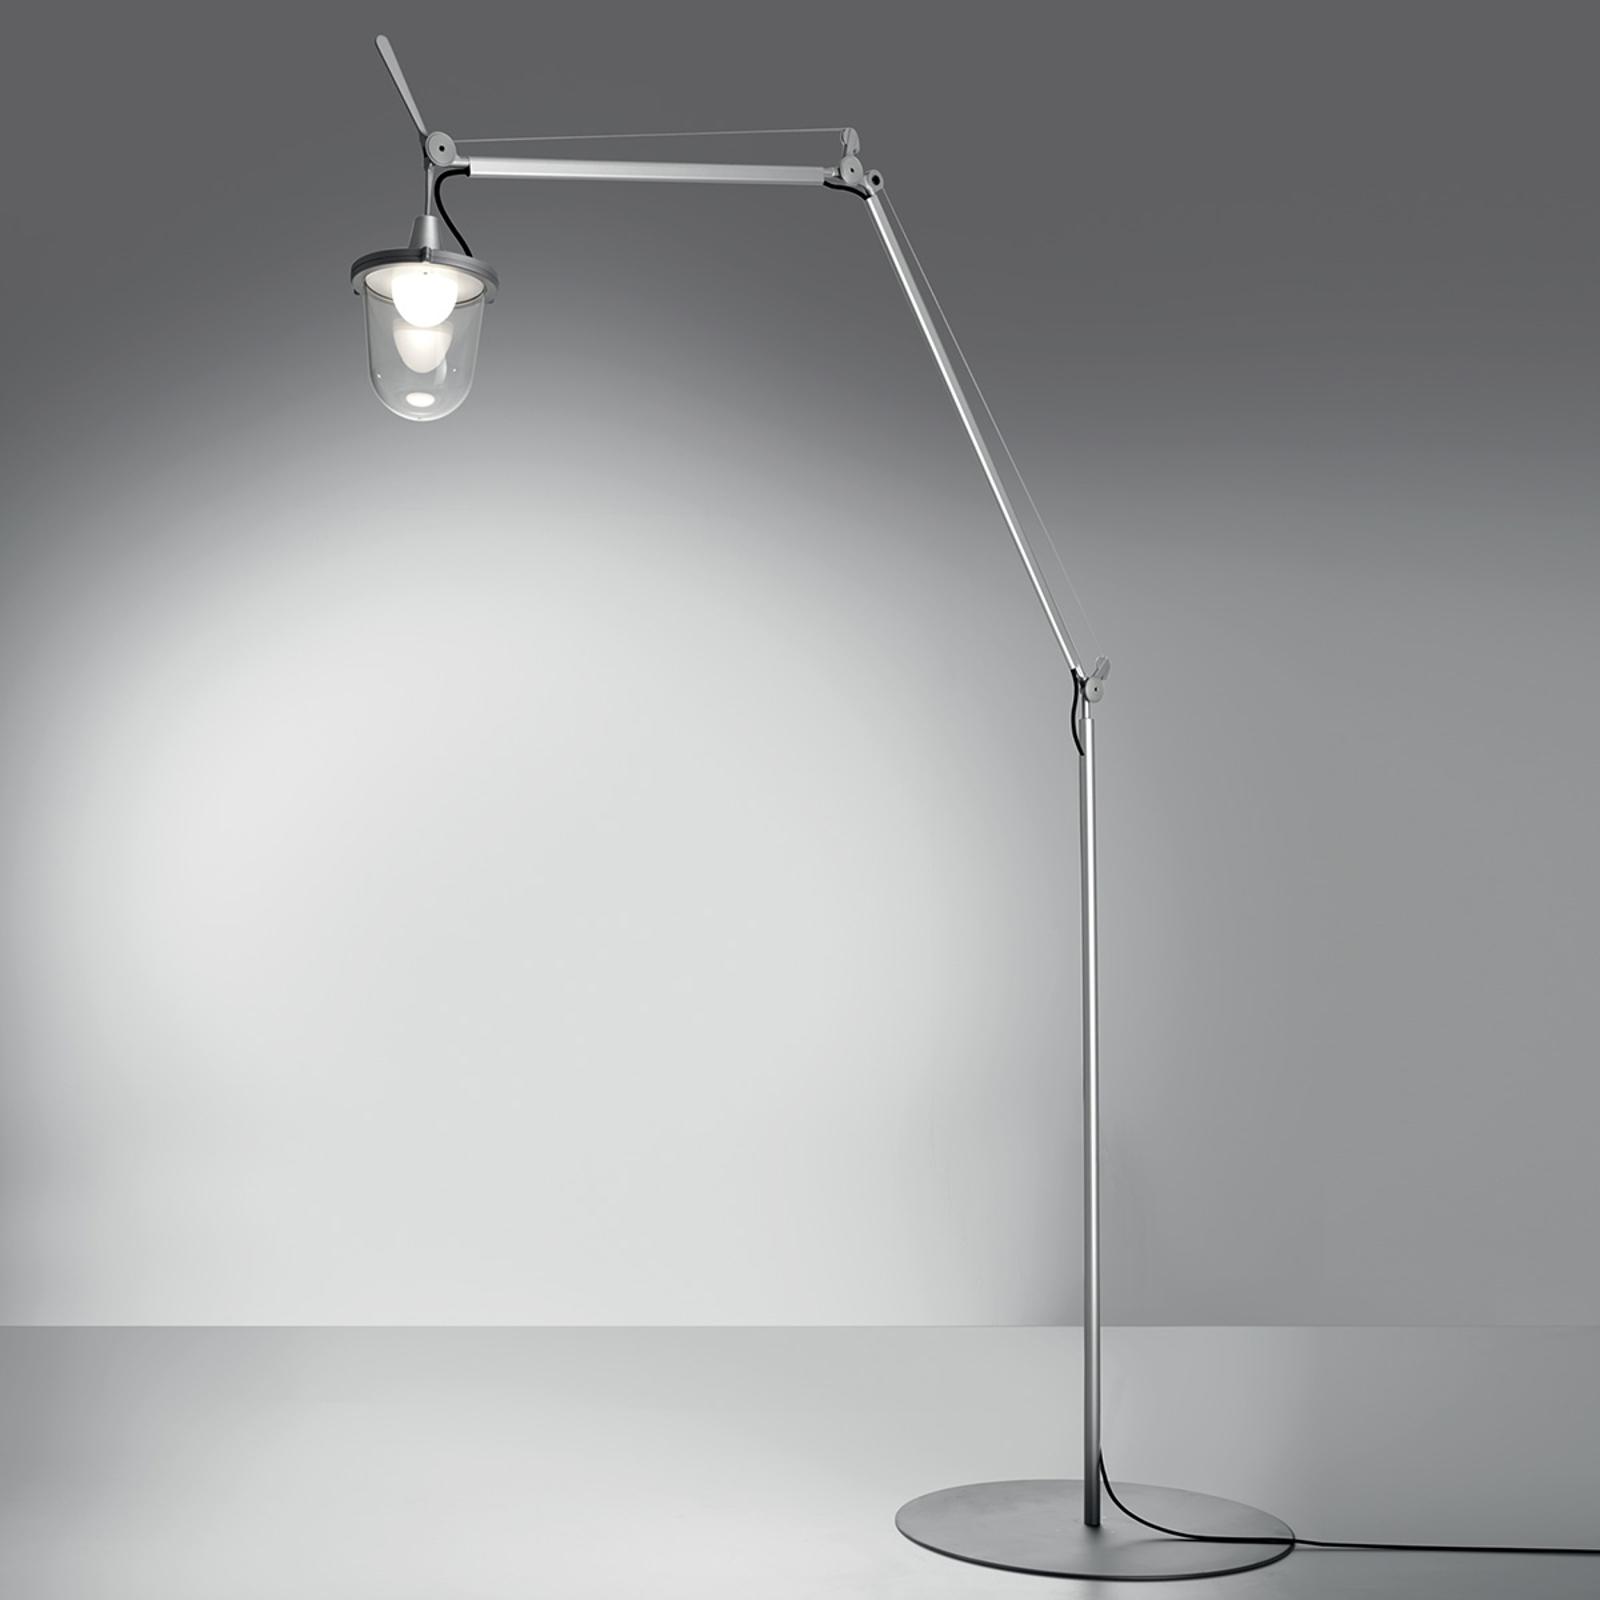 Artemide Tolomeo Lampione Terrassenlampe